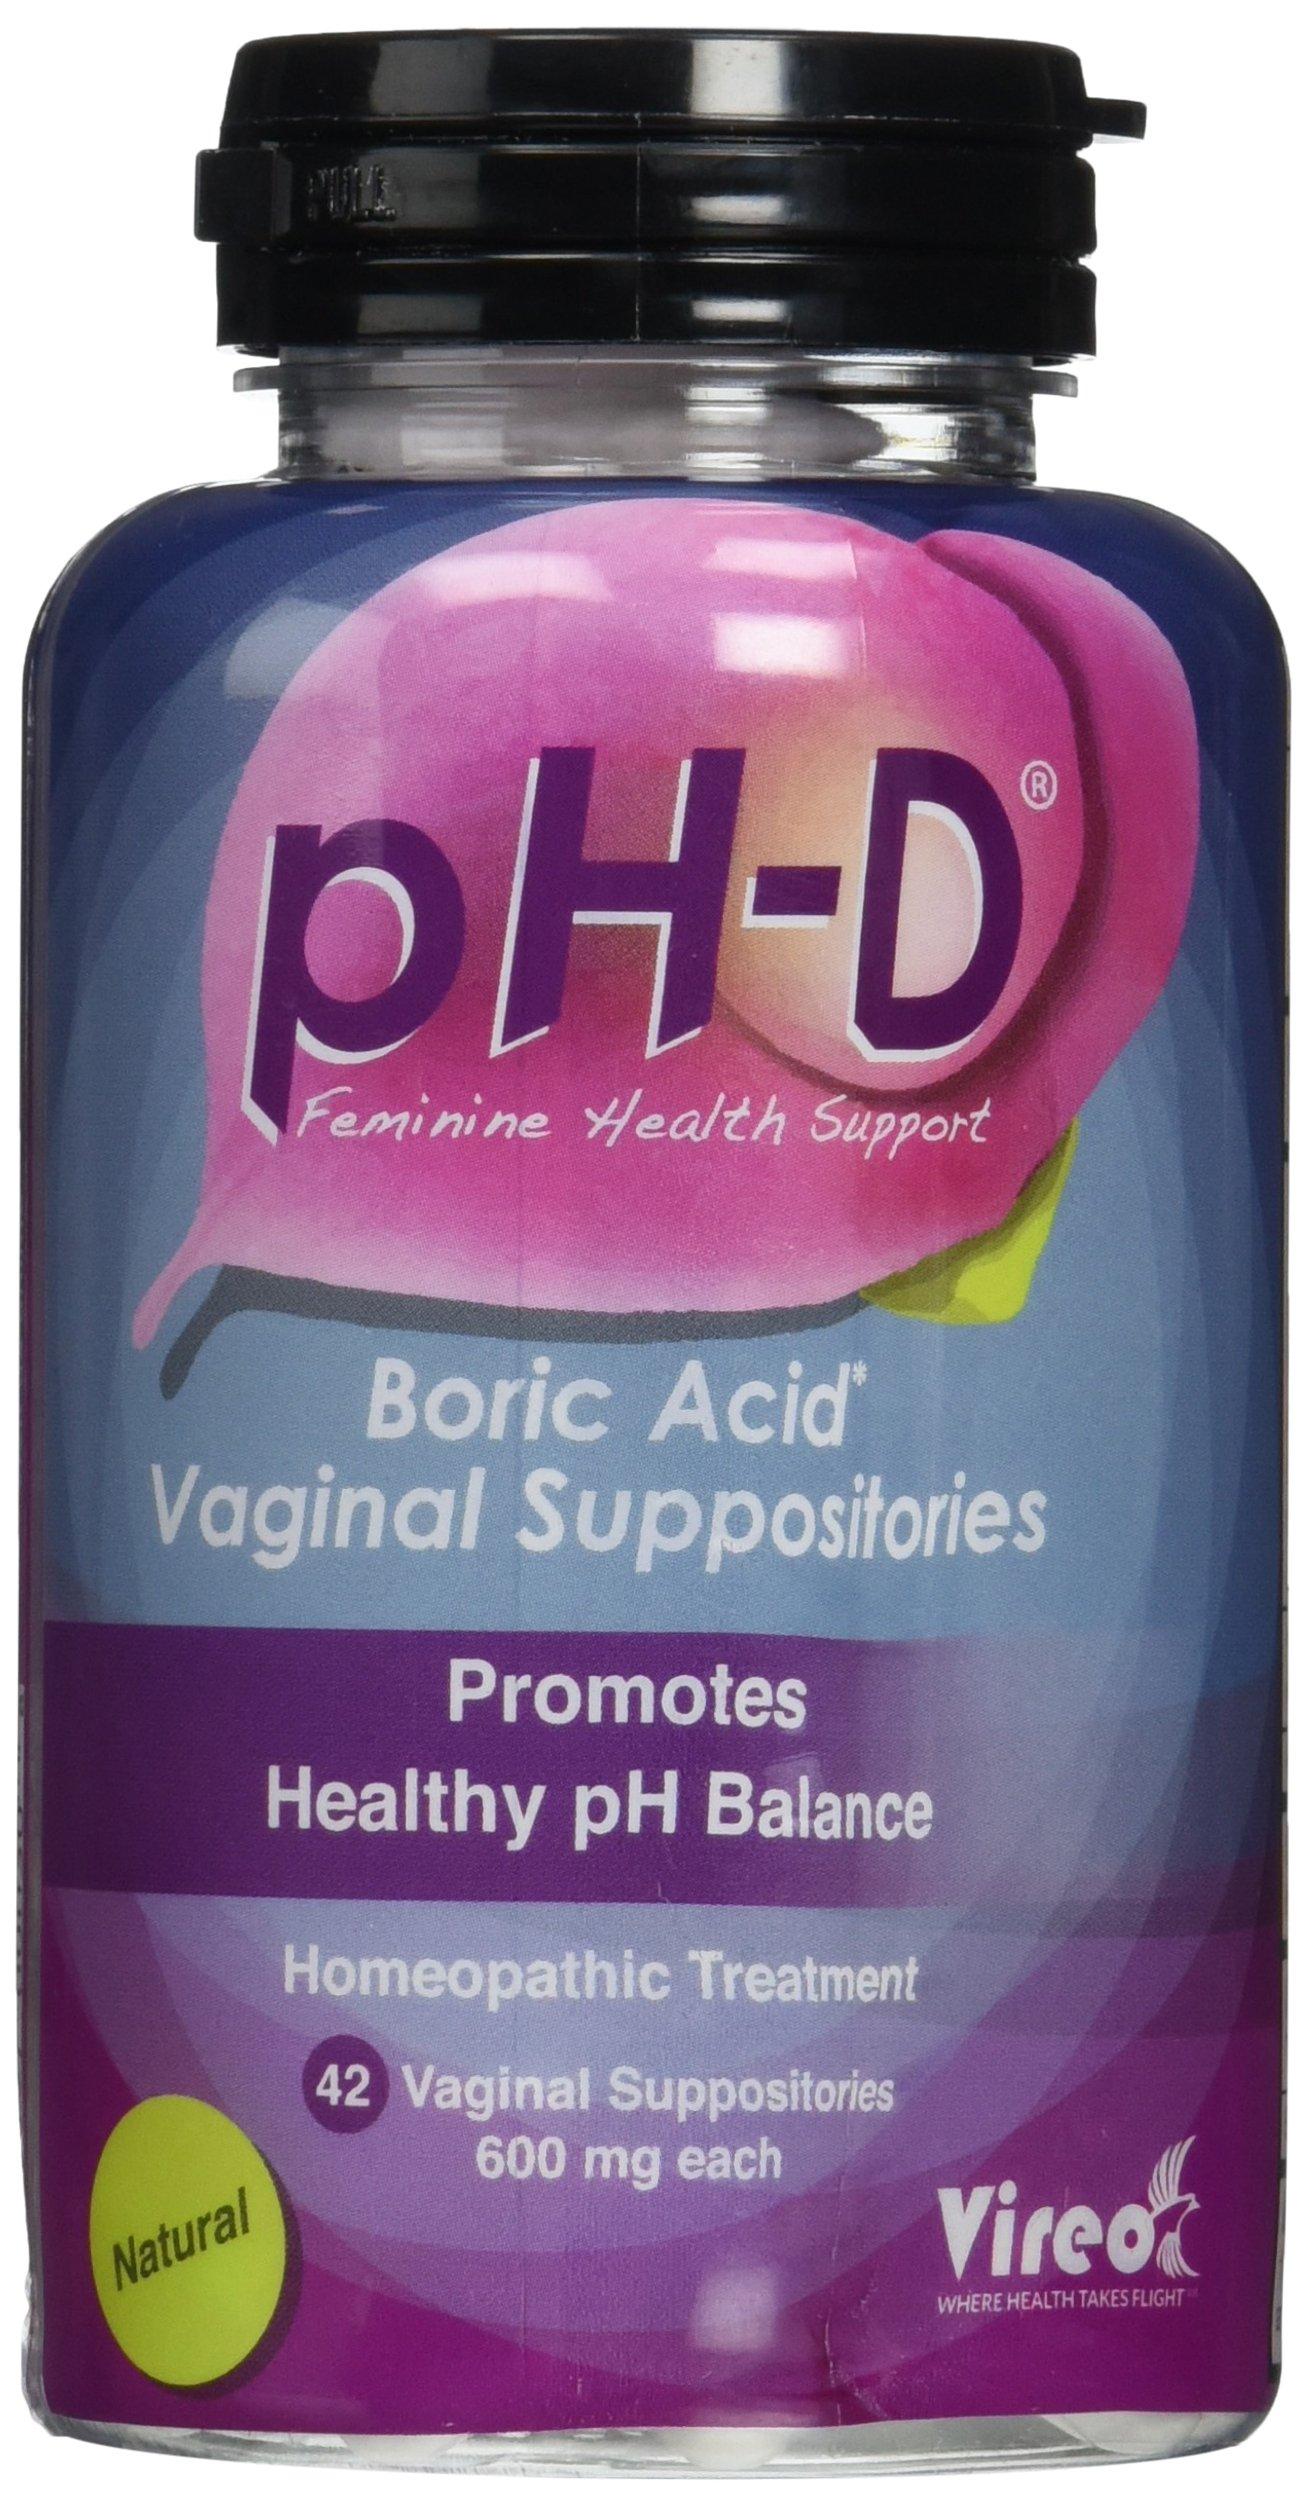 pH-D Feminine Health Support, Boric Acid Vaginal Suppositories, Bottle of 42 (600mg)